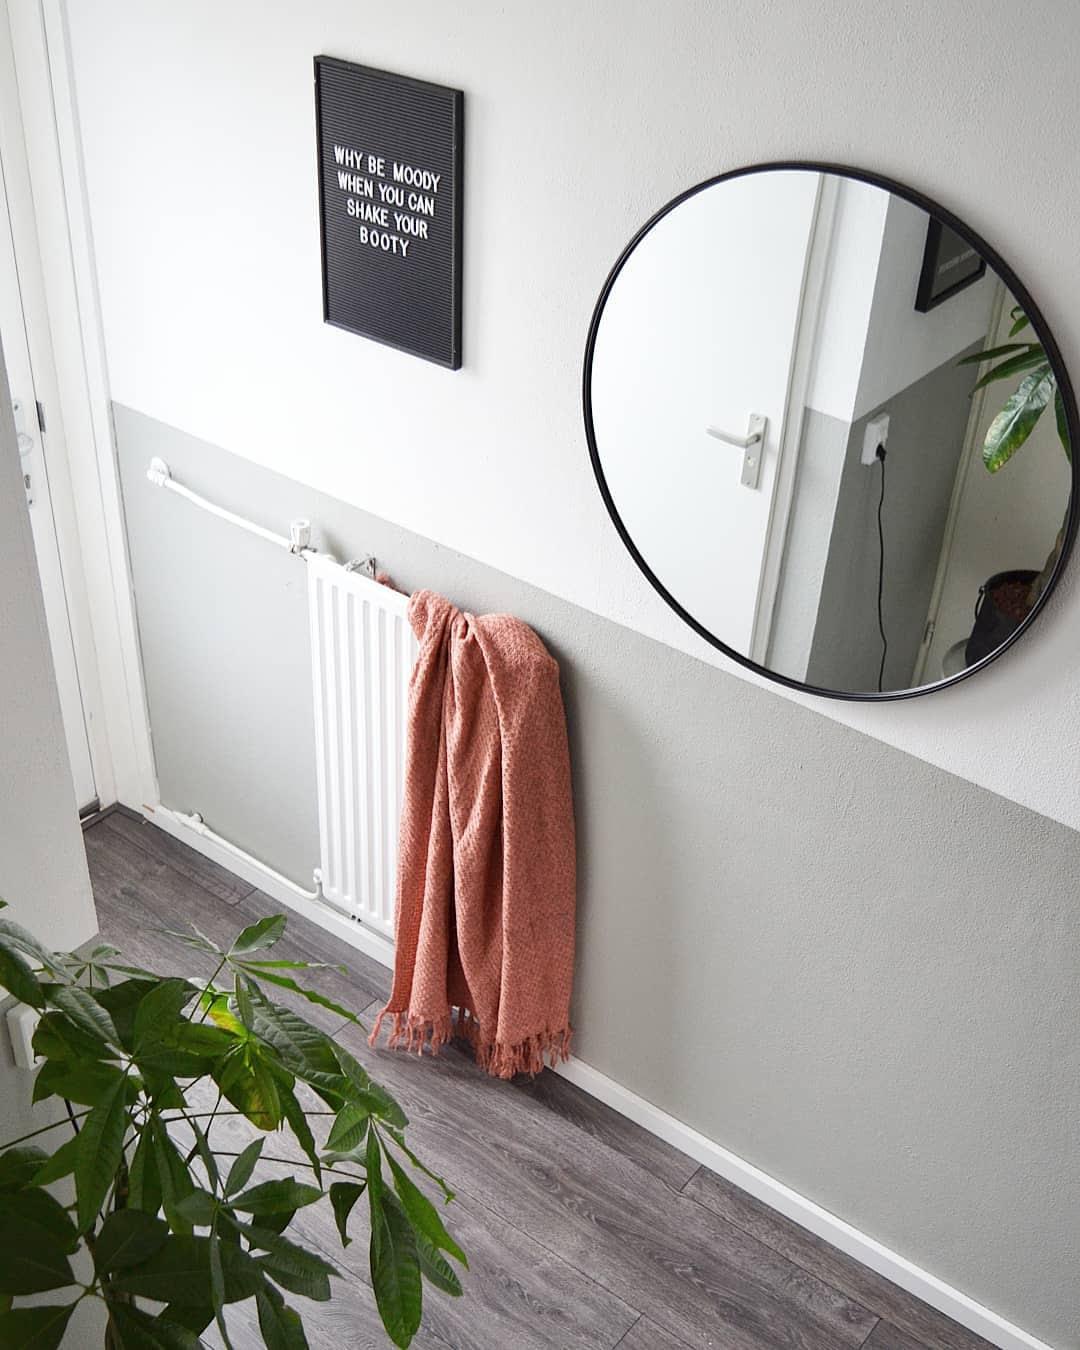 ronde spiegel in lichte hal met letterbord en plant